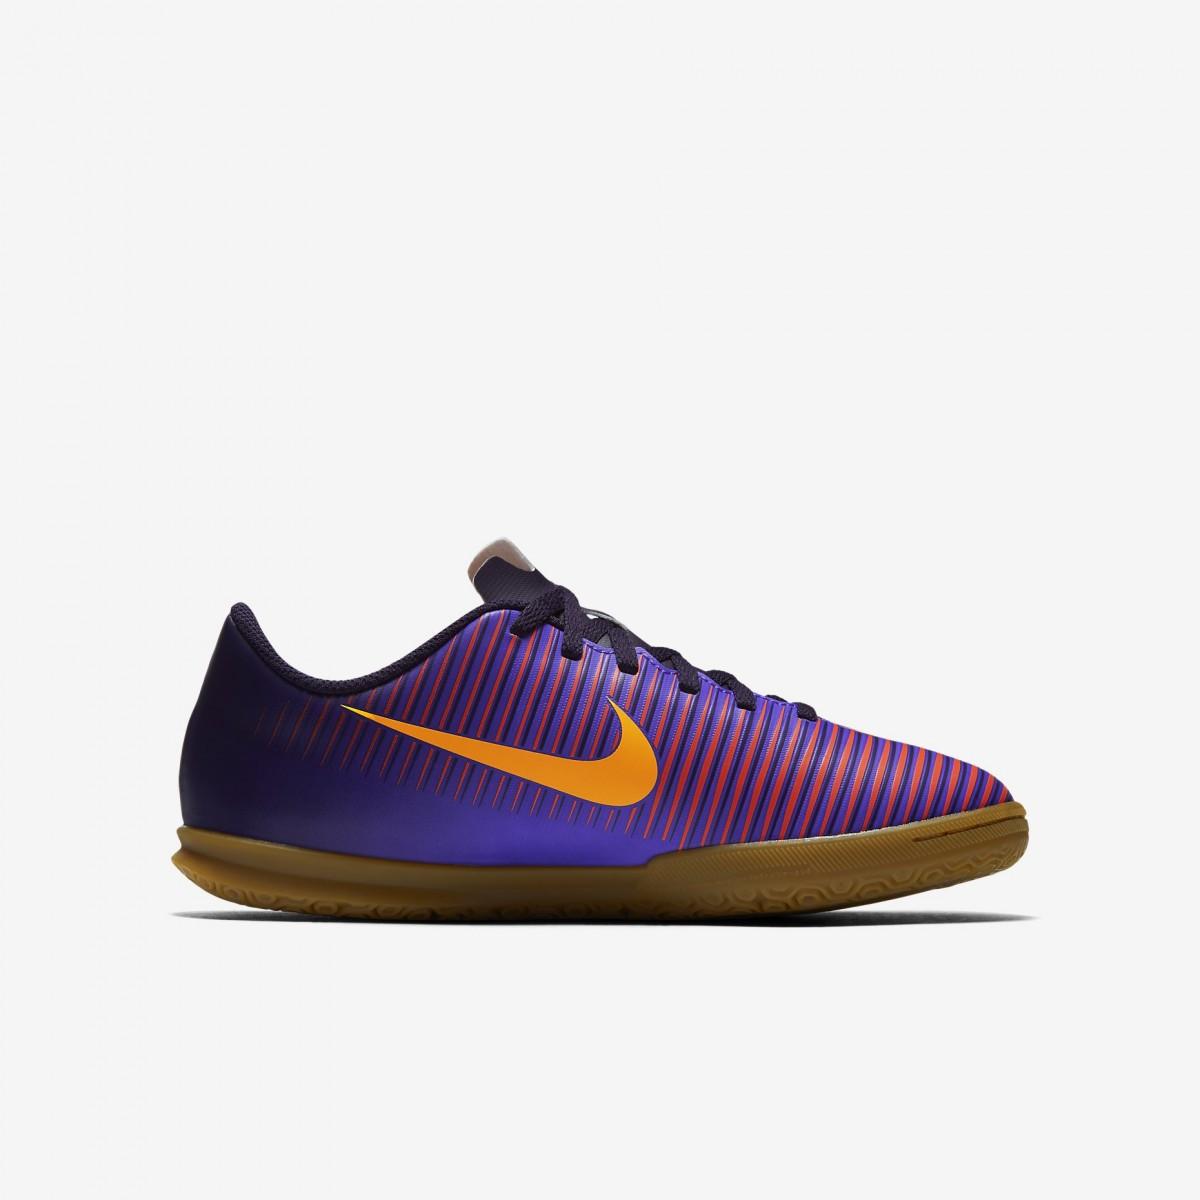 Bizz Store - Chuteira Infantil Futsal Nike JR Mercurial Vortex II 5375485226563